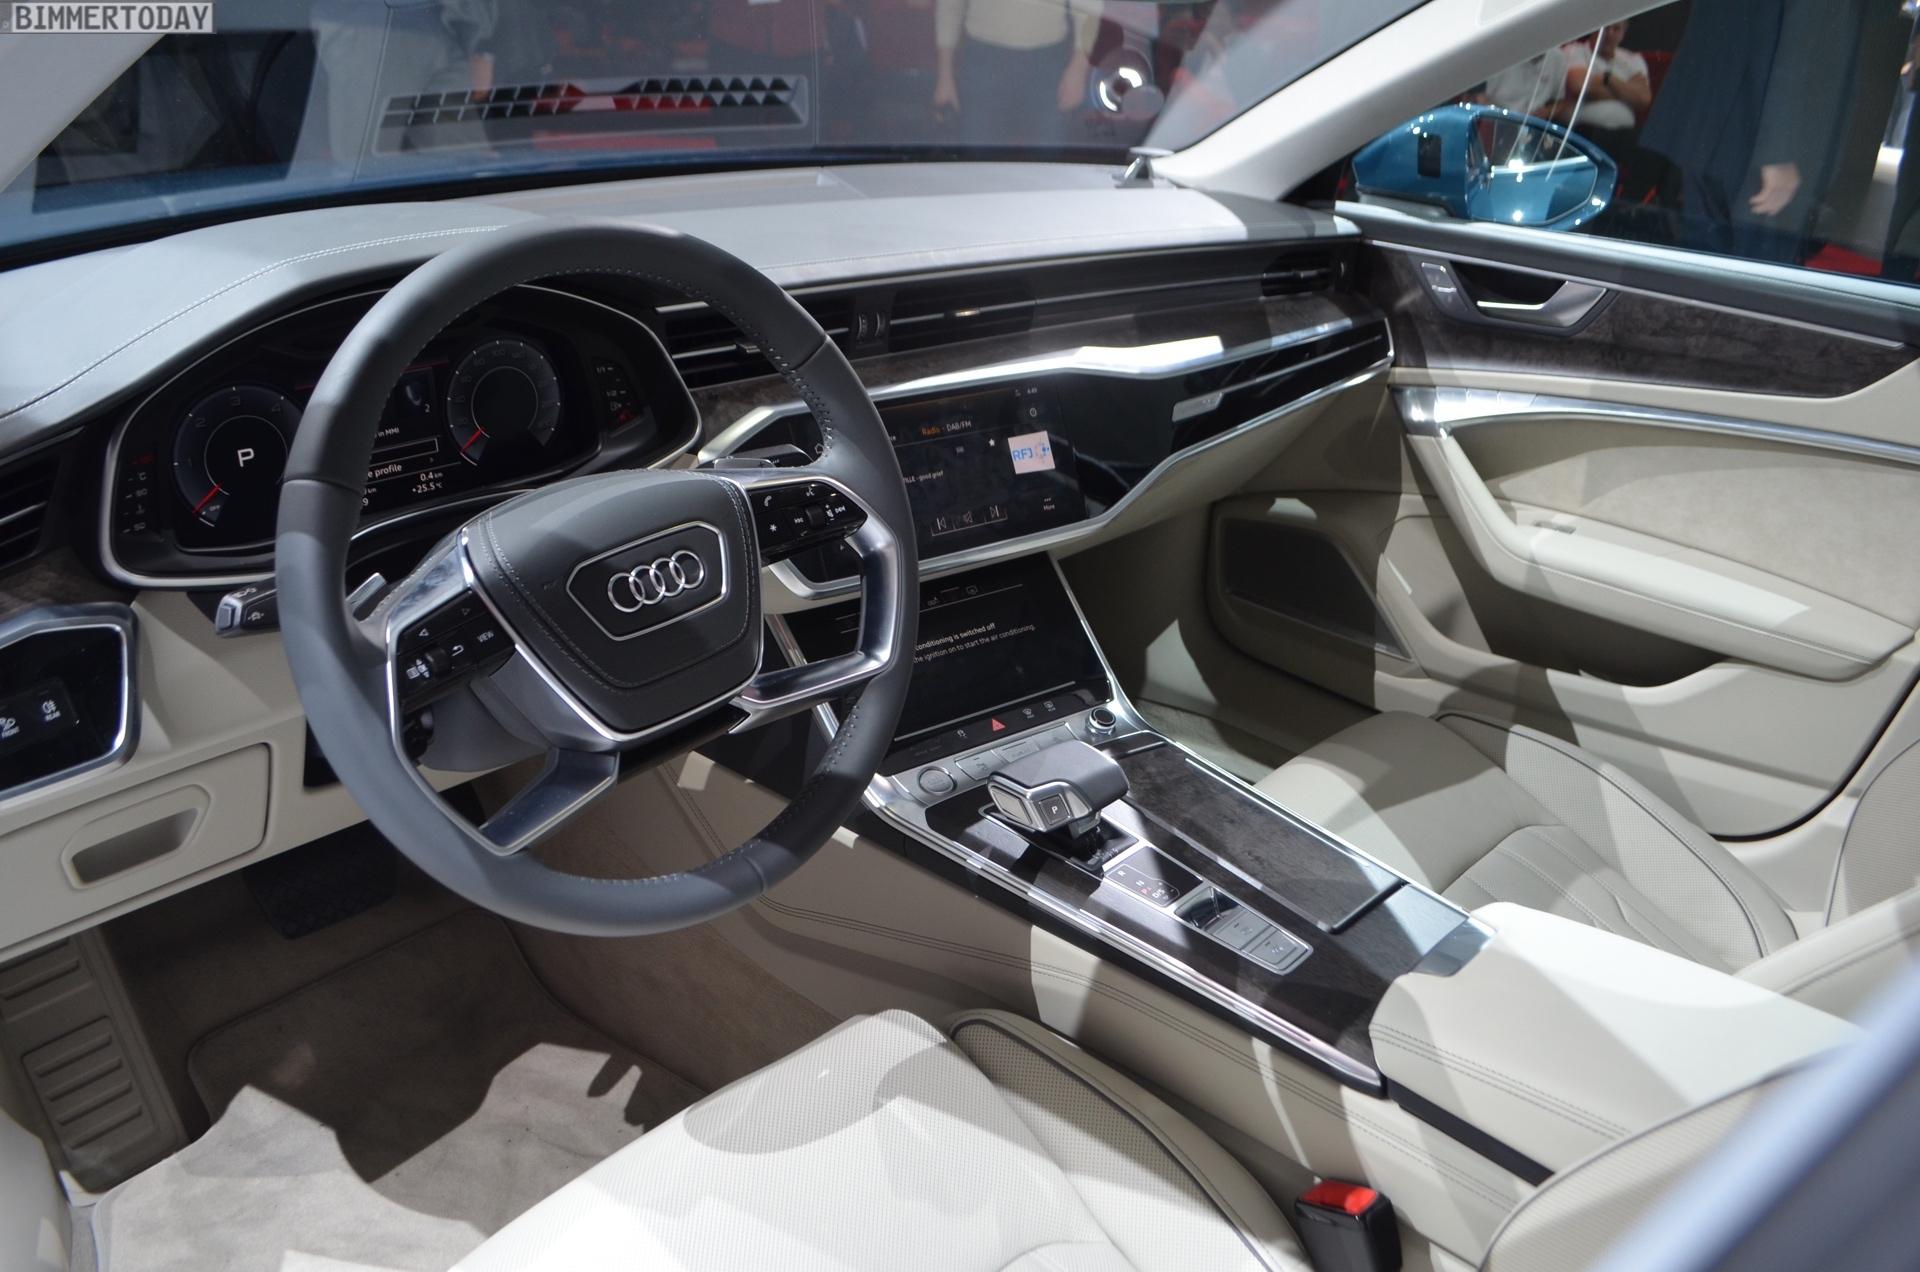 Genf 2018 Audi A6 50 TDI quattro s Line Interieur Live 01